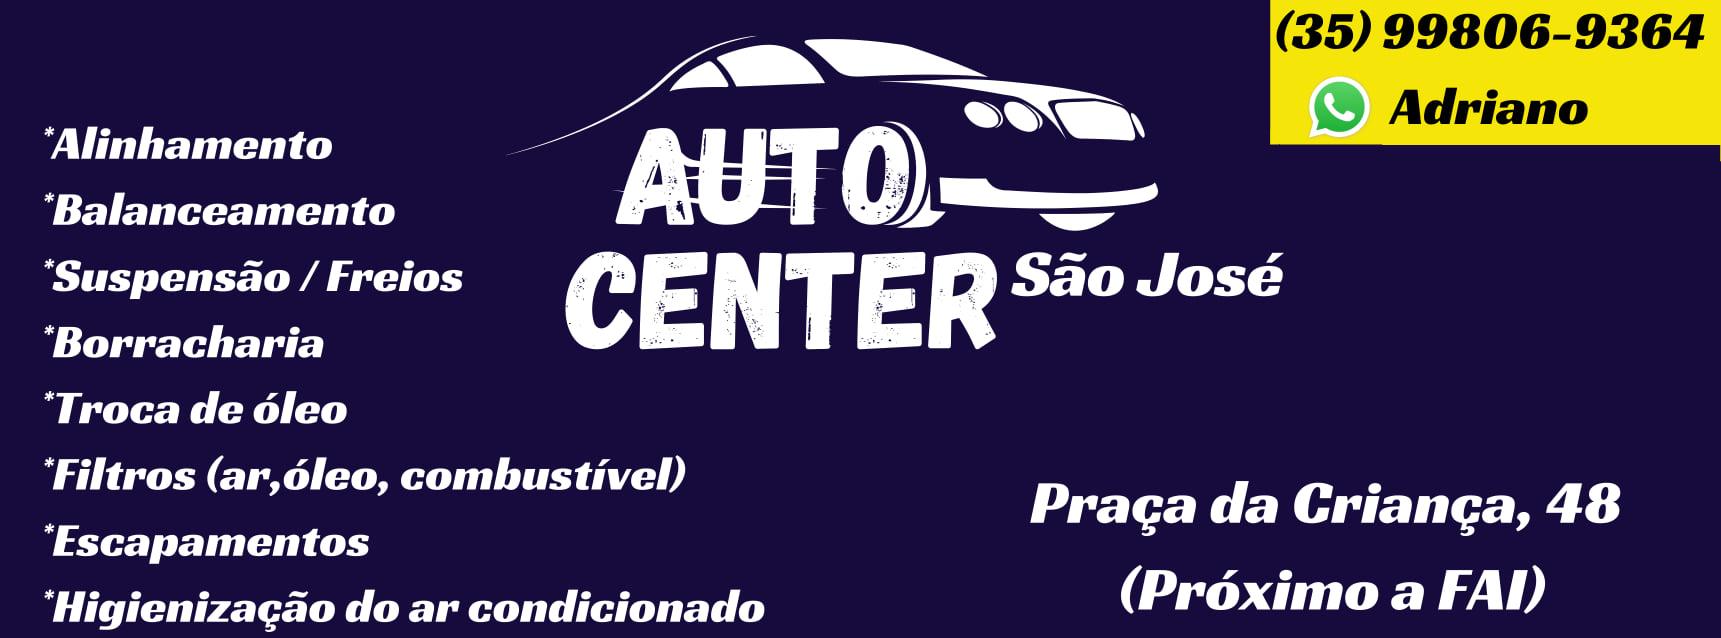 auto center sao jose ofere